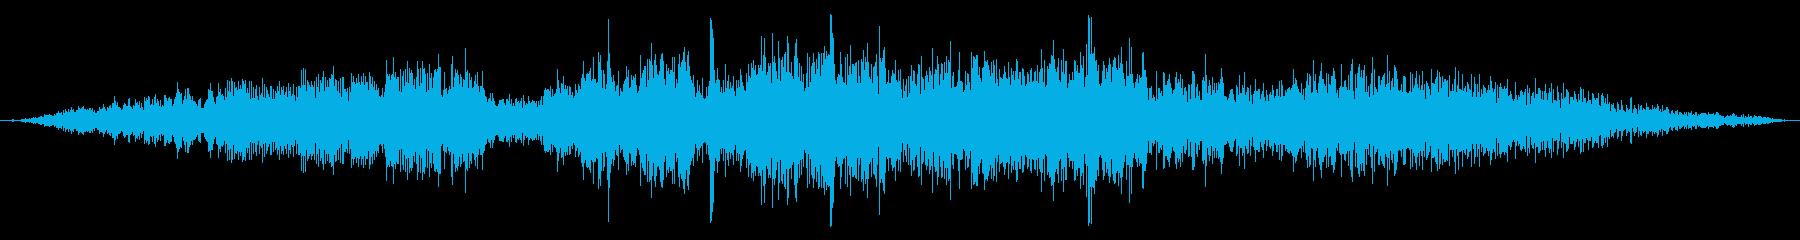 【F1】超ド迫力のF1エンジン効果音6!の再生済みの波形